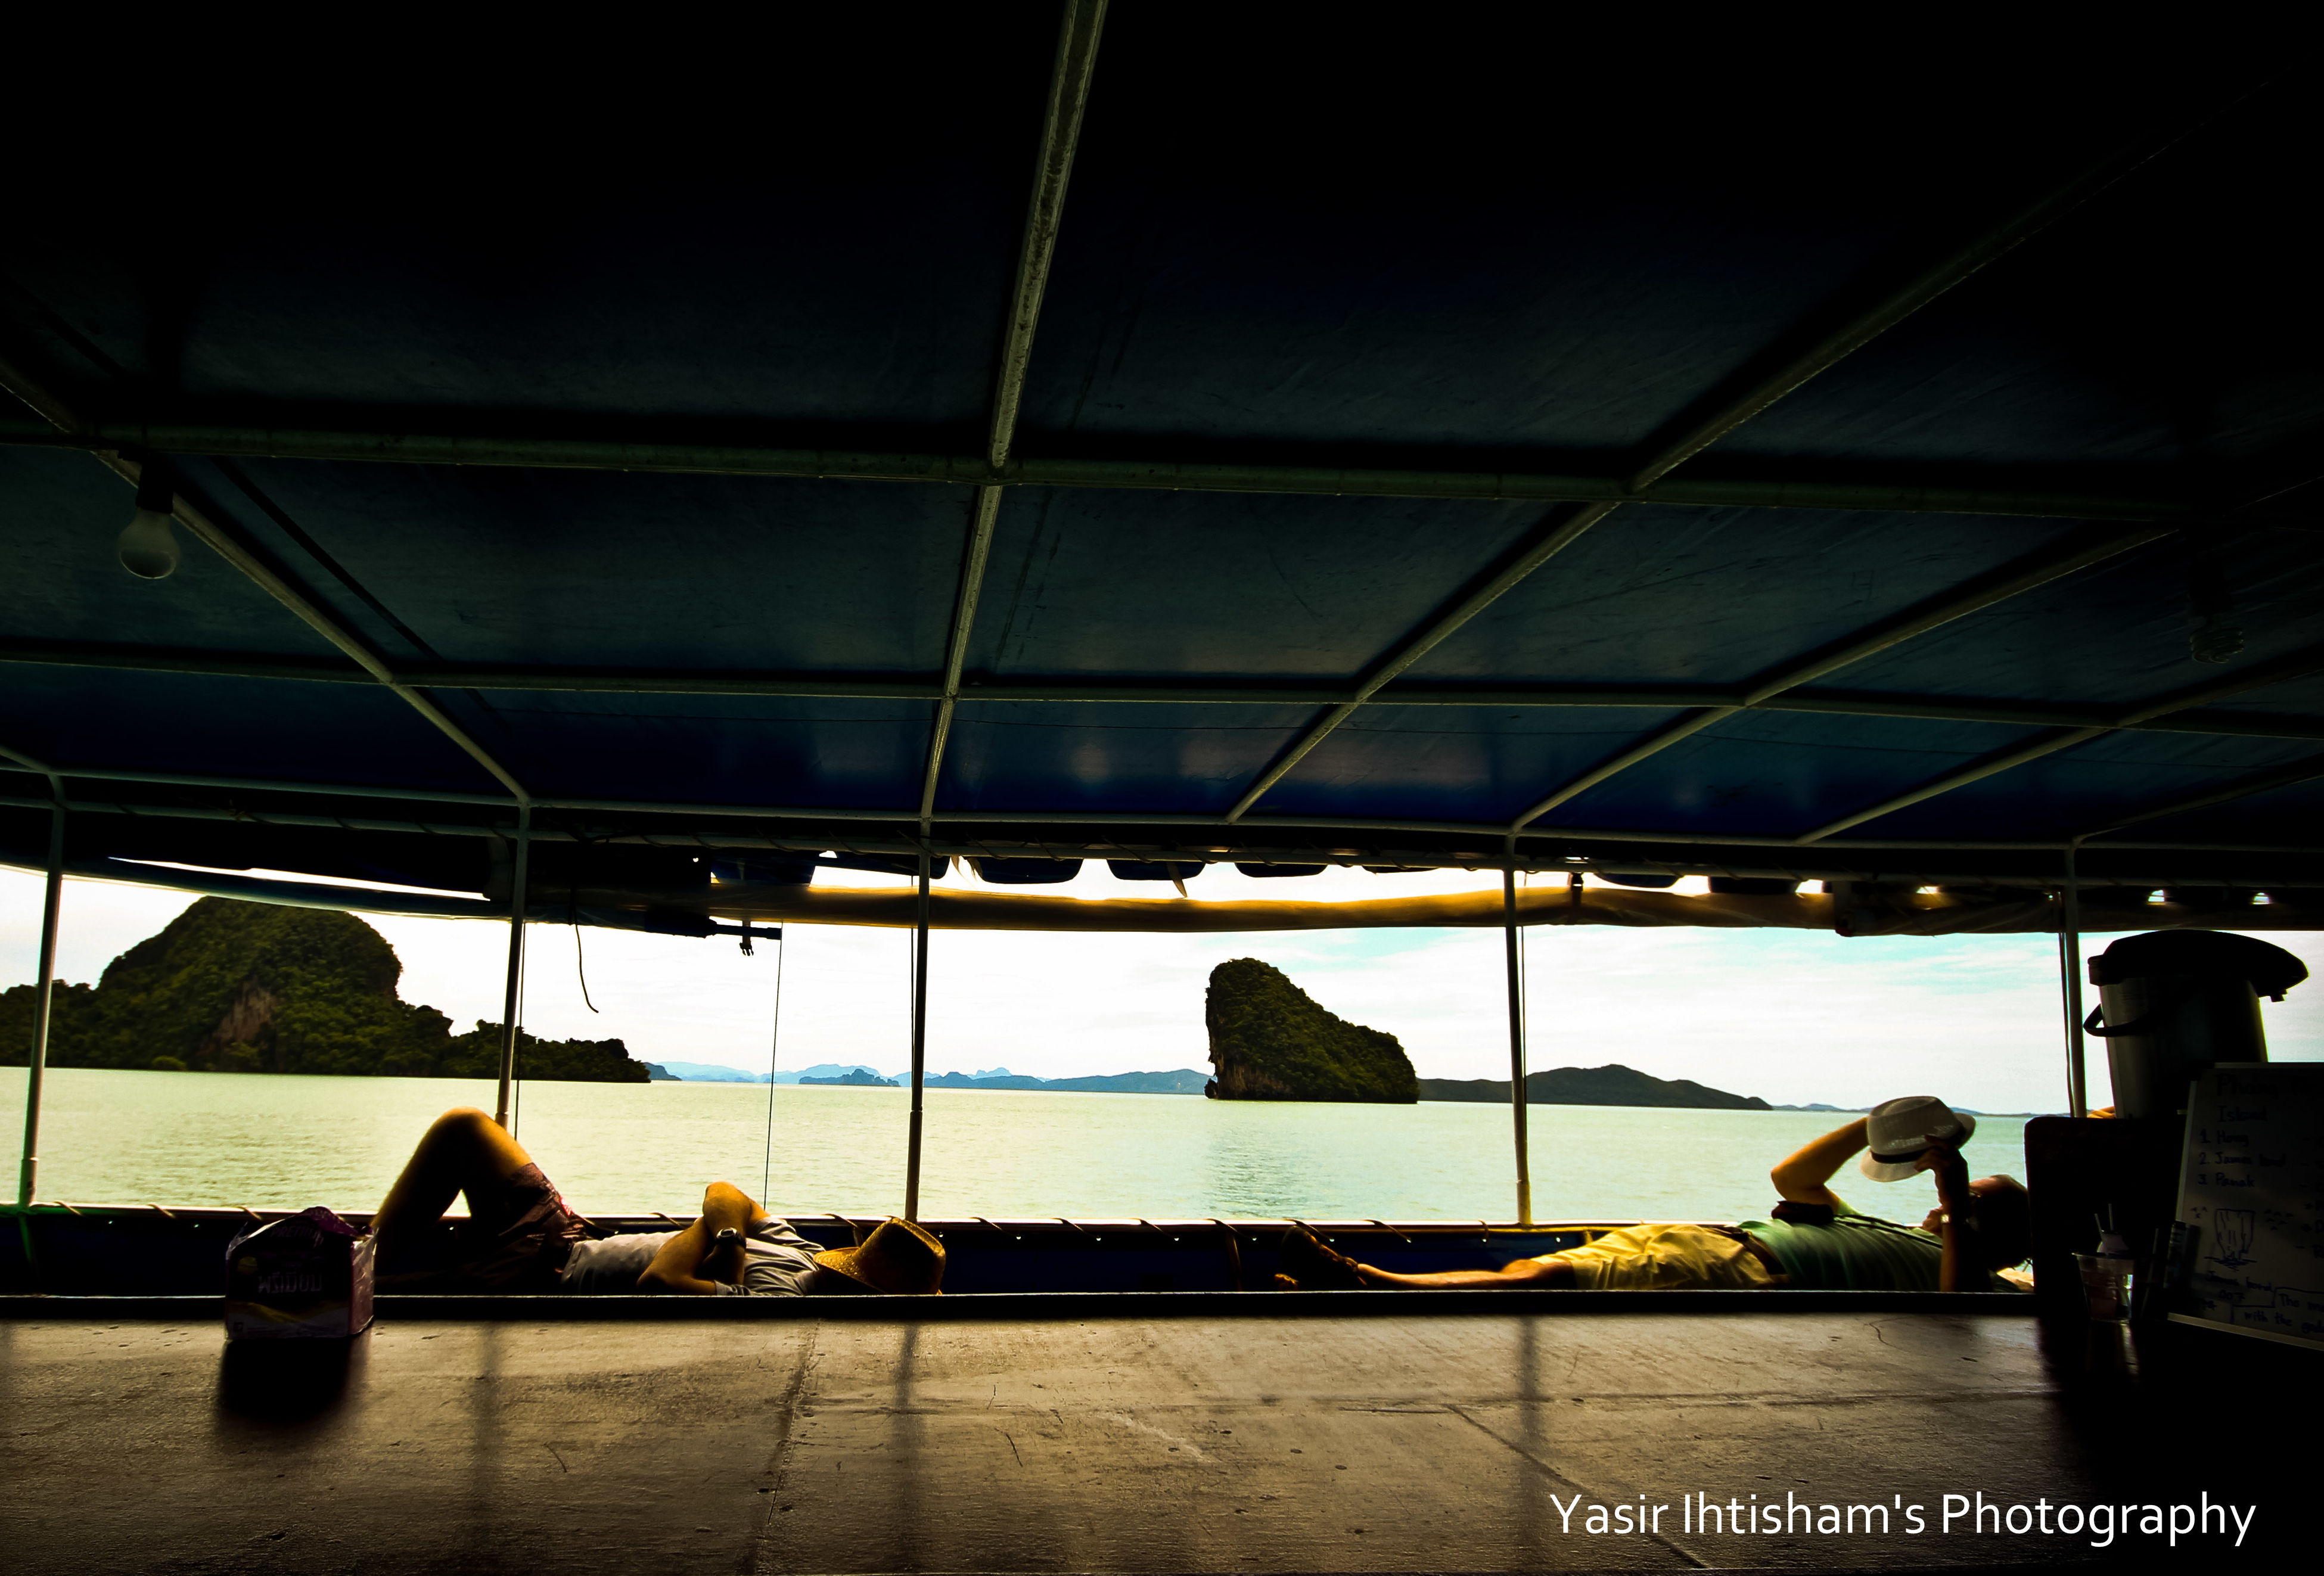 One of my favourites from phi phi island thiland trip.... - Yasir Yasir Phi Phi Island @phuket StreamzooVille Eye For Photography Travel Photography